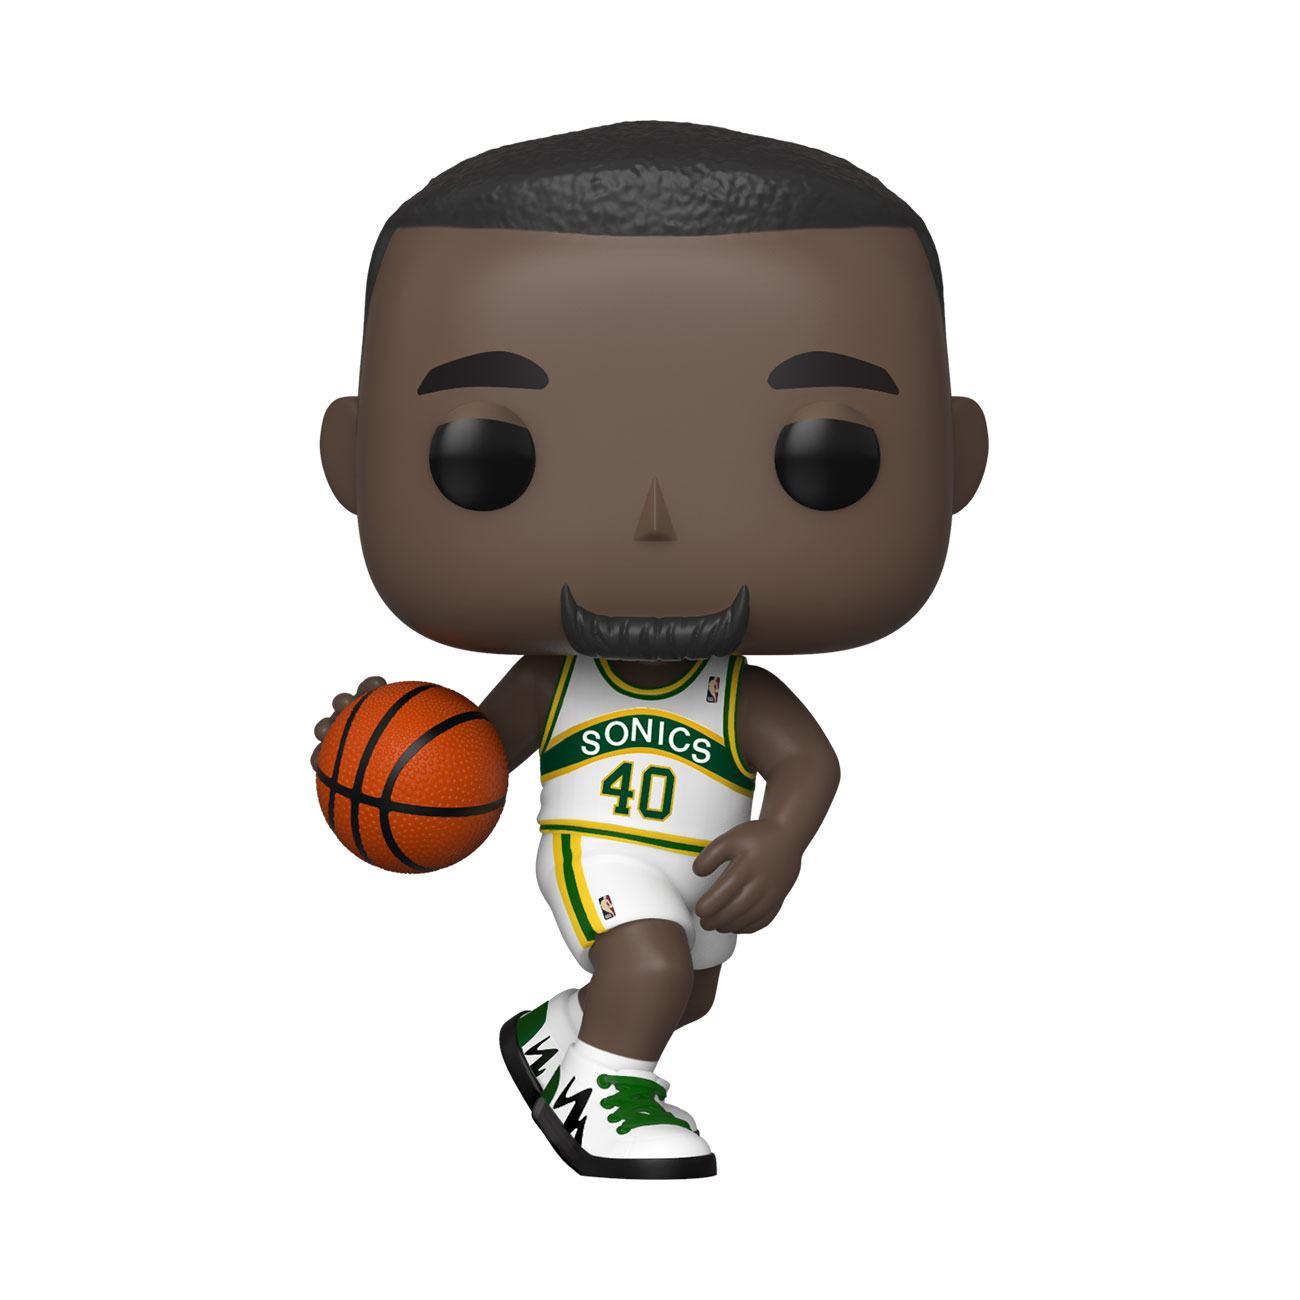 NBA Legends POP! Sports Vinyl Figure Shawn Kemp (Sonics home) 9 cm